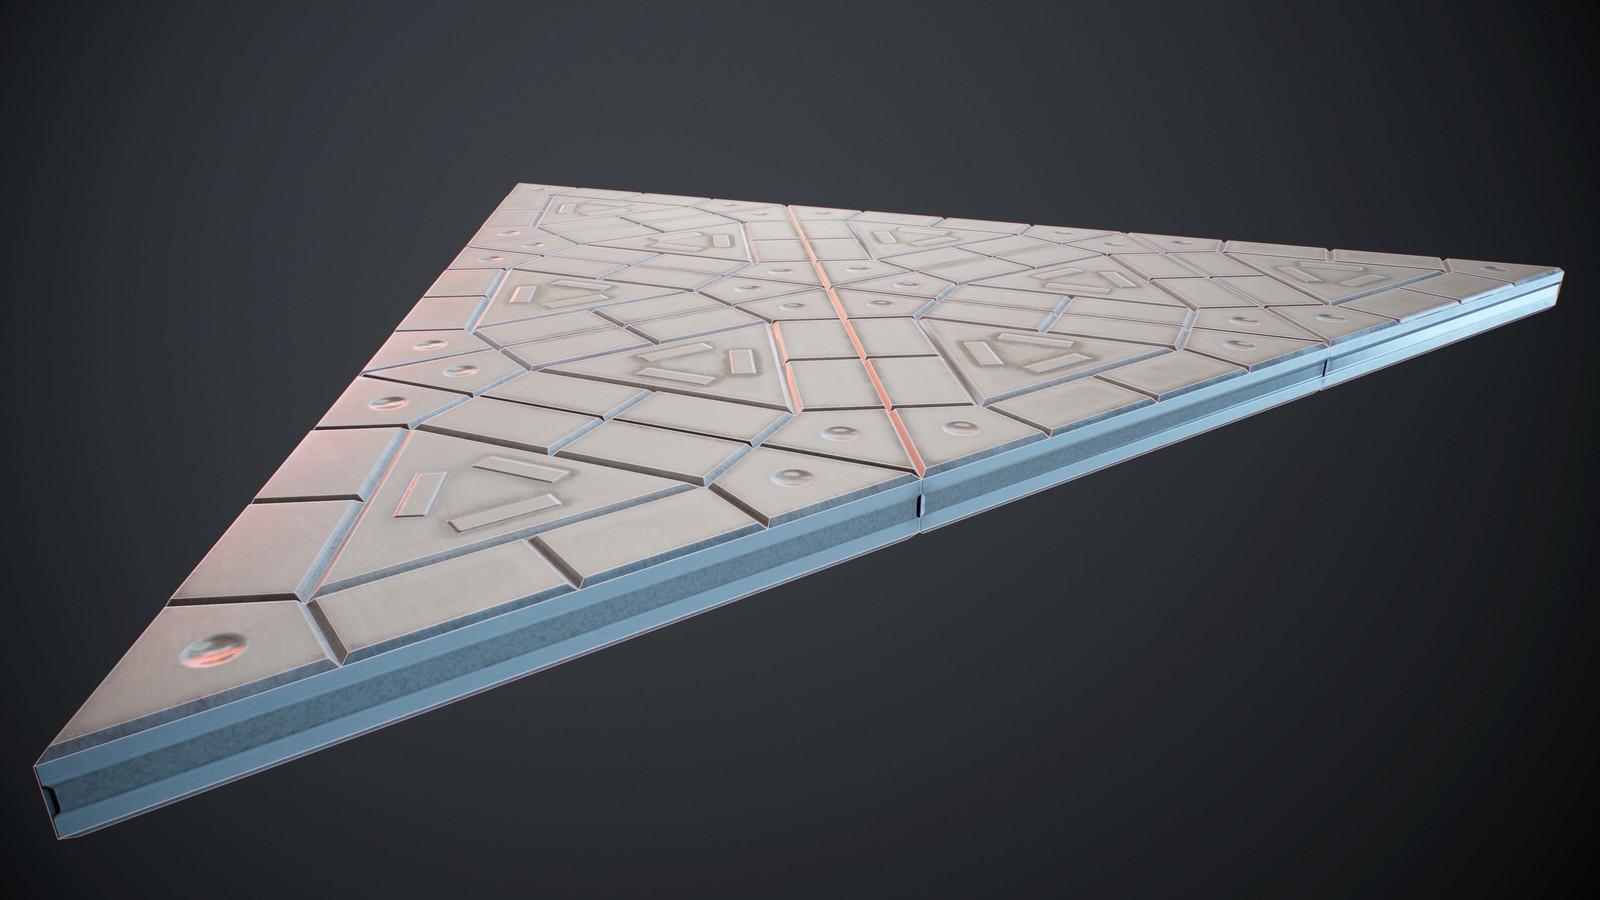 Triangular plastic ground wireframe